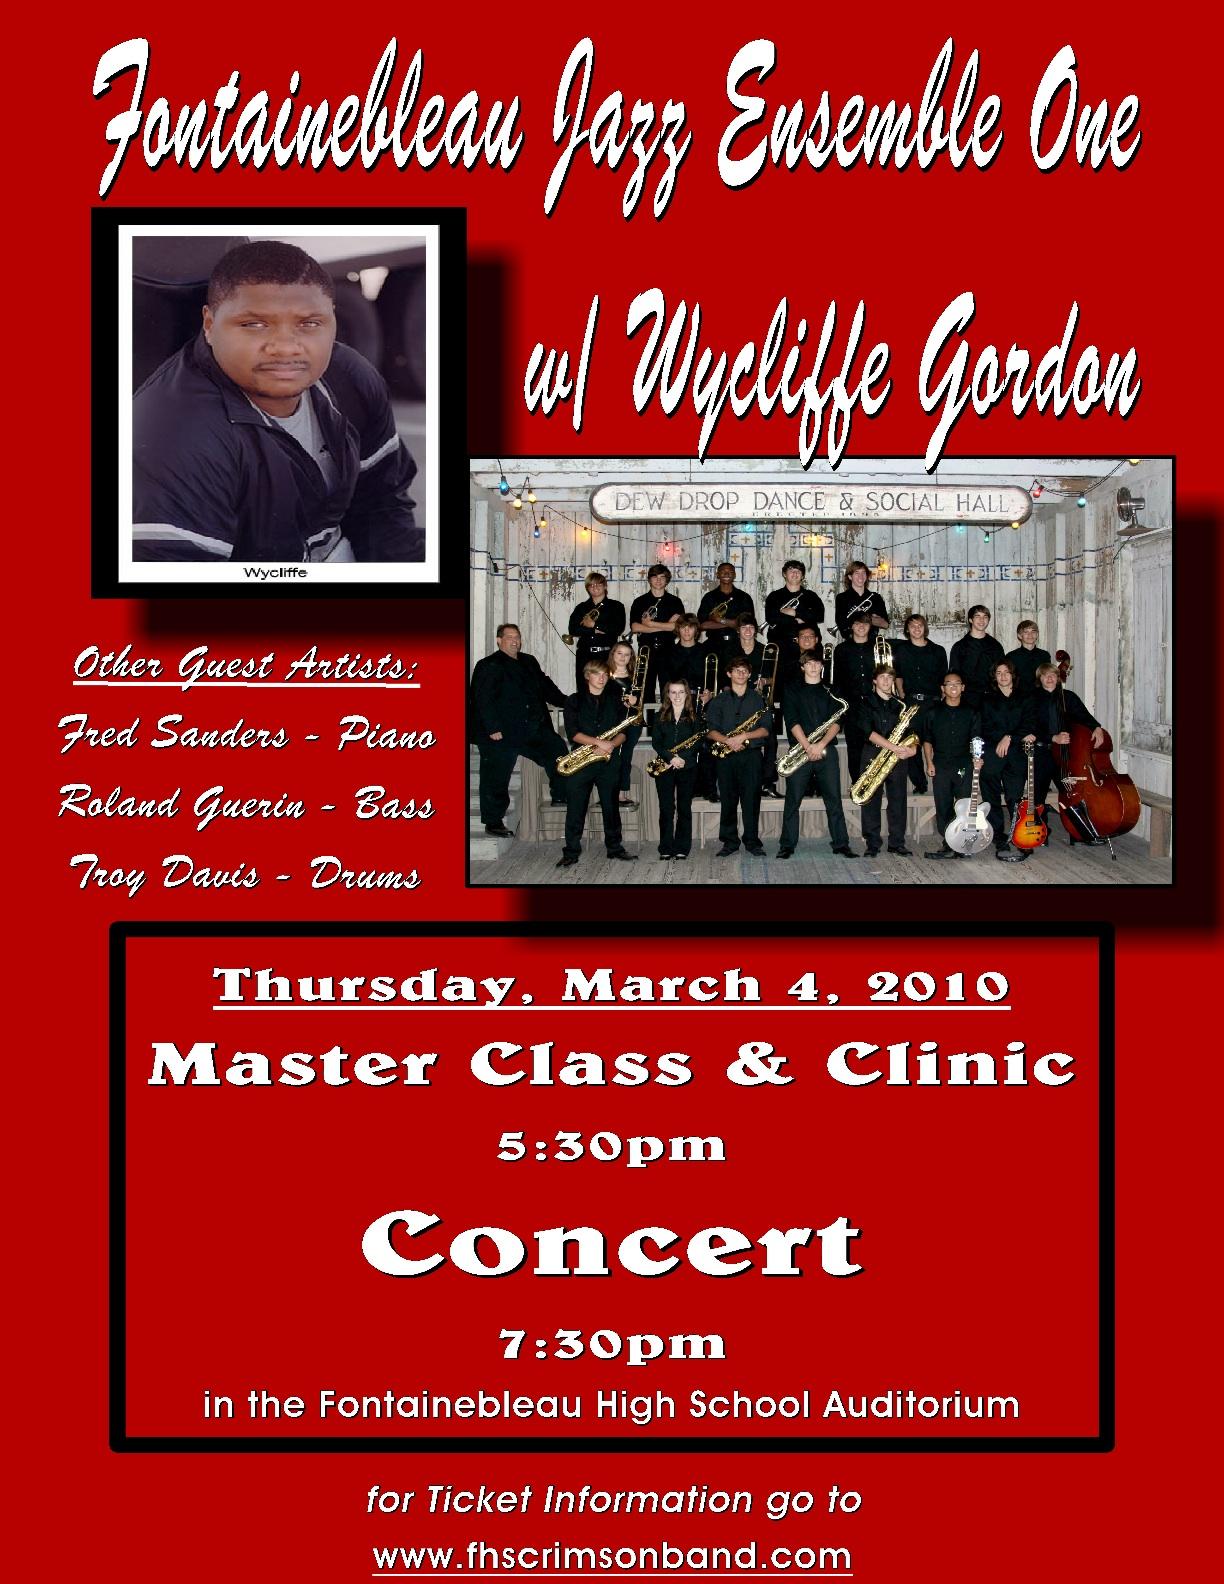 Wycliffe Concert Poster.jpg